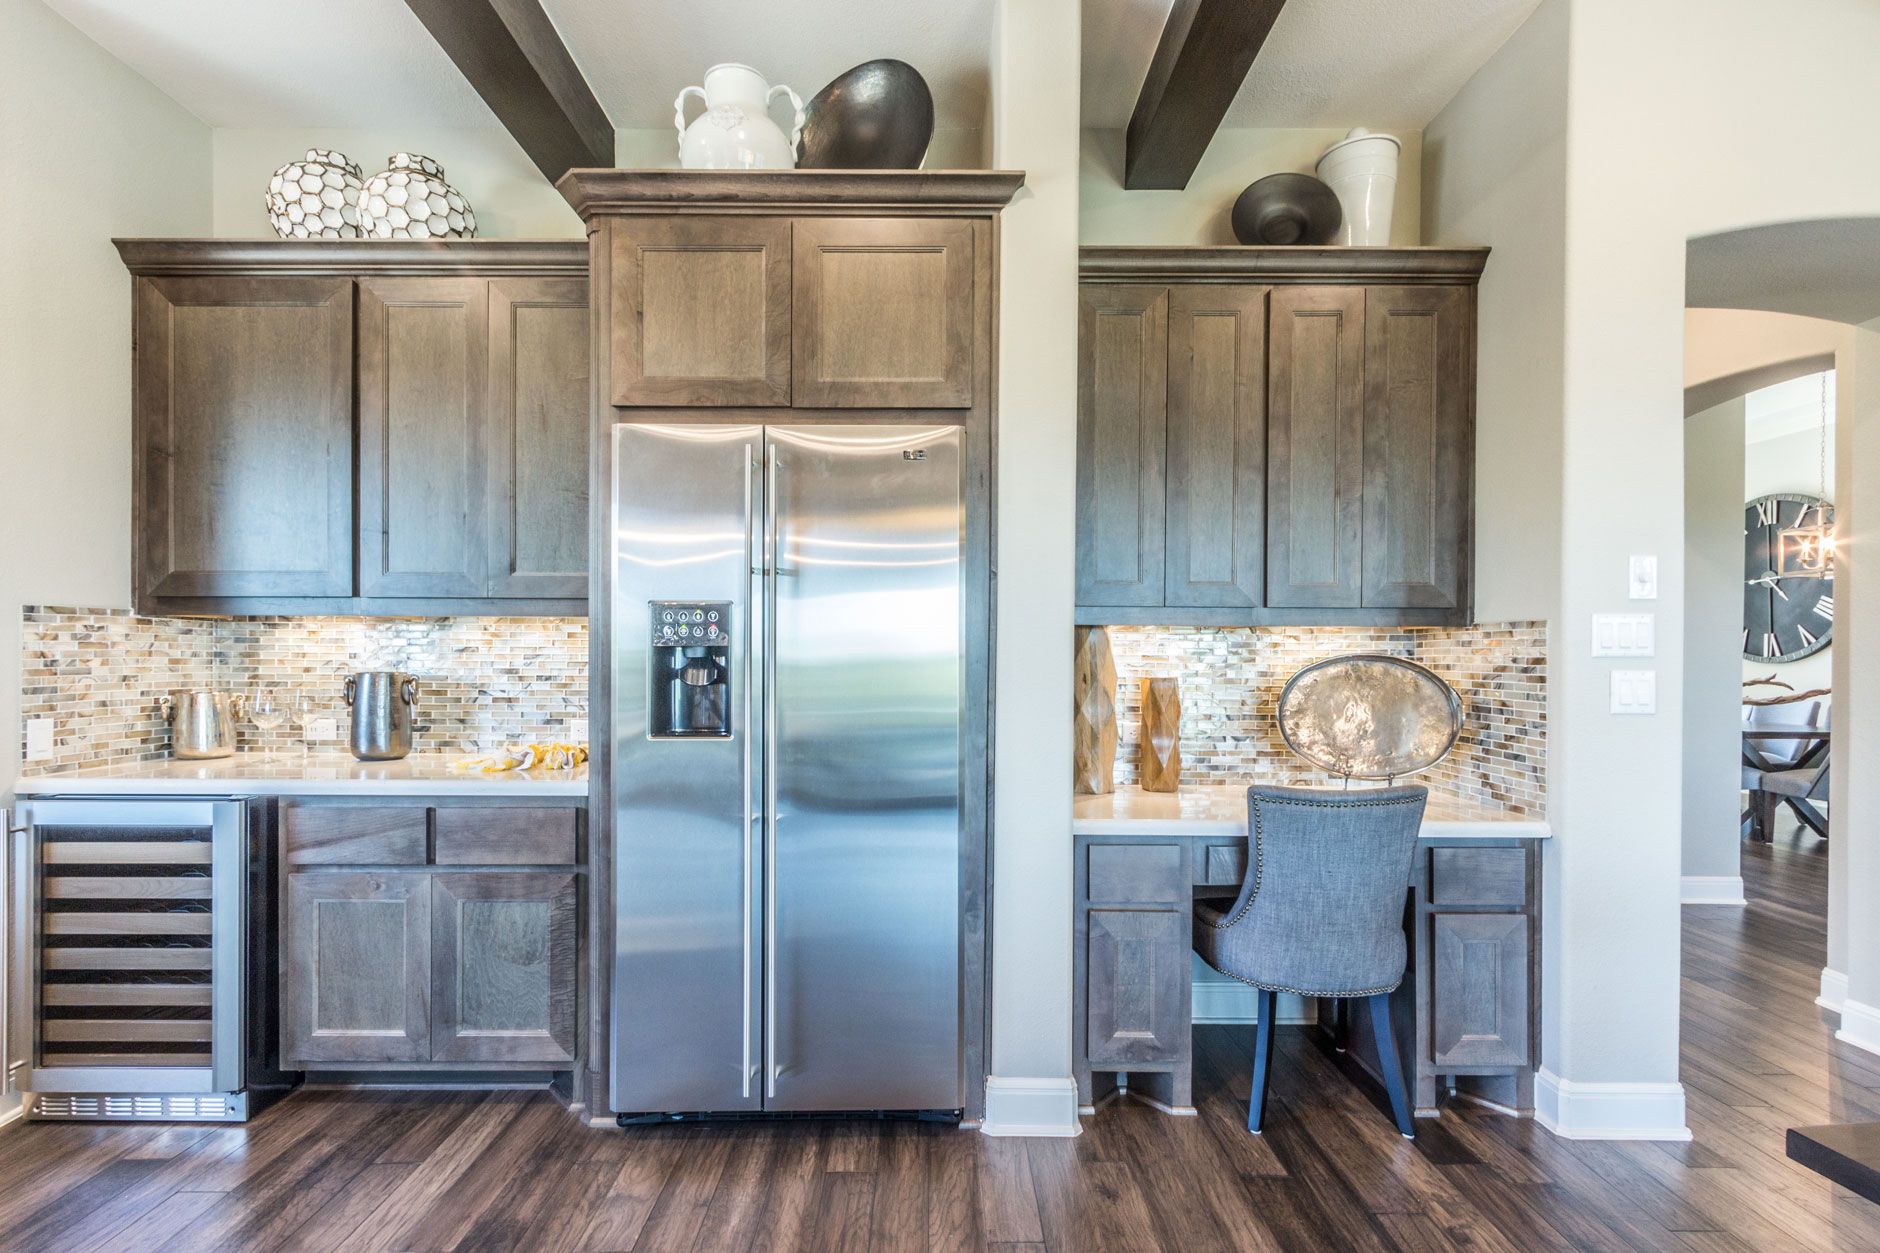 Kitchen desk TaylorCraft mitered cabinet doors hard maple gray stain